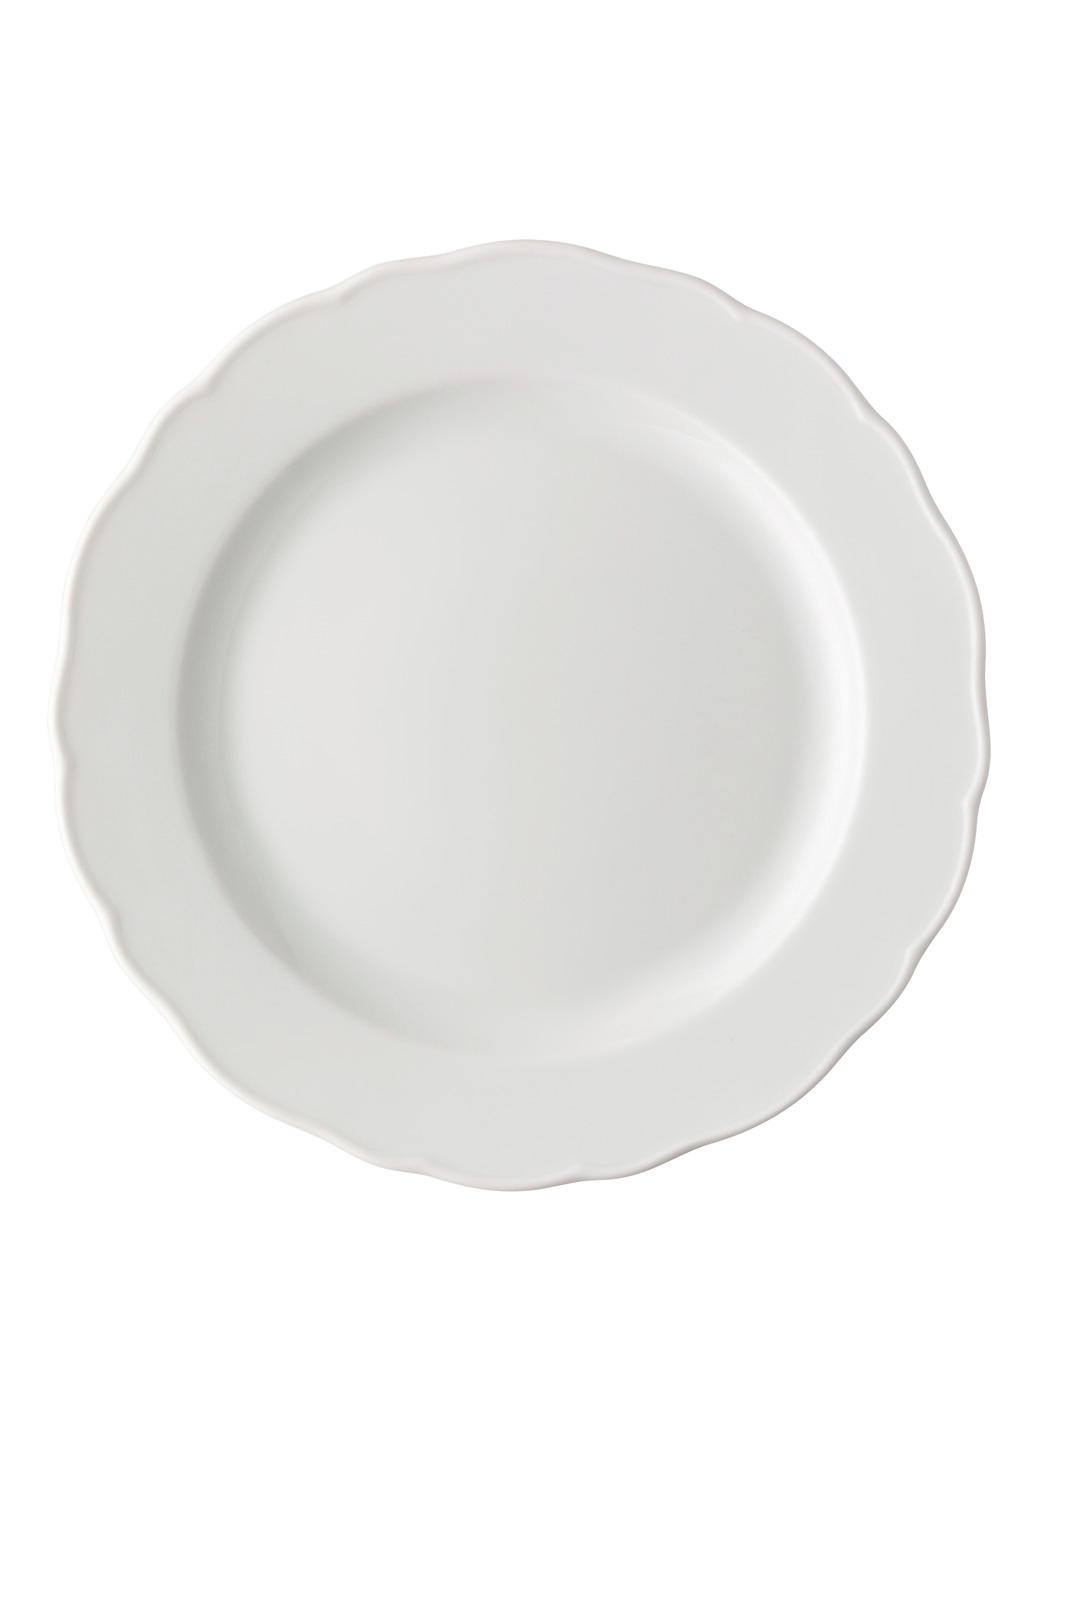 Plat bord 27 cm